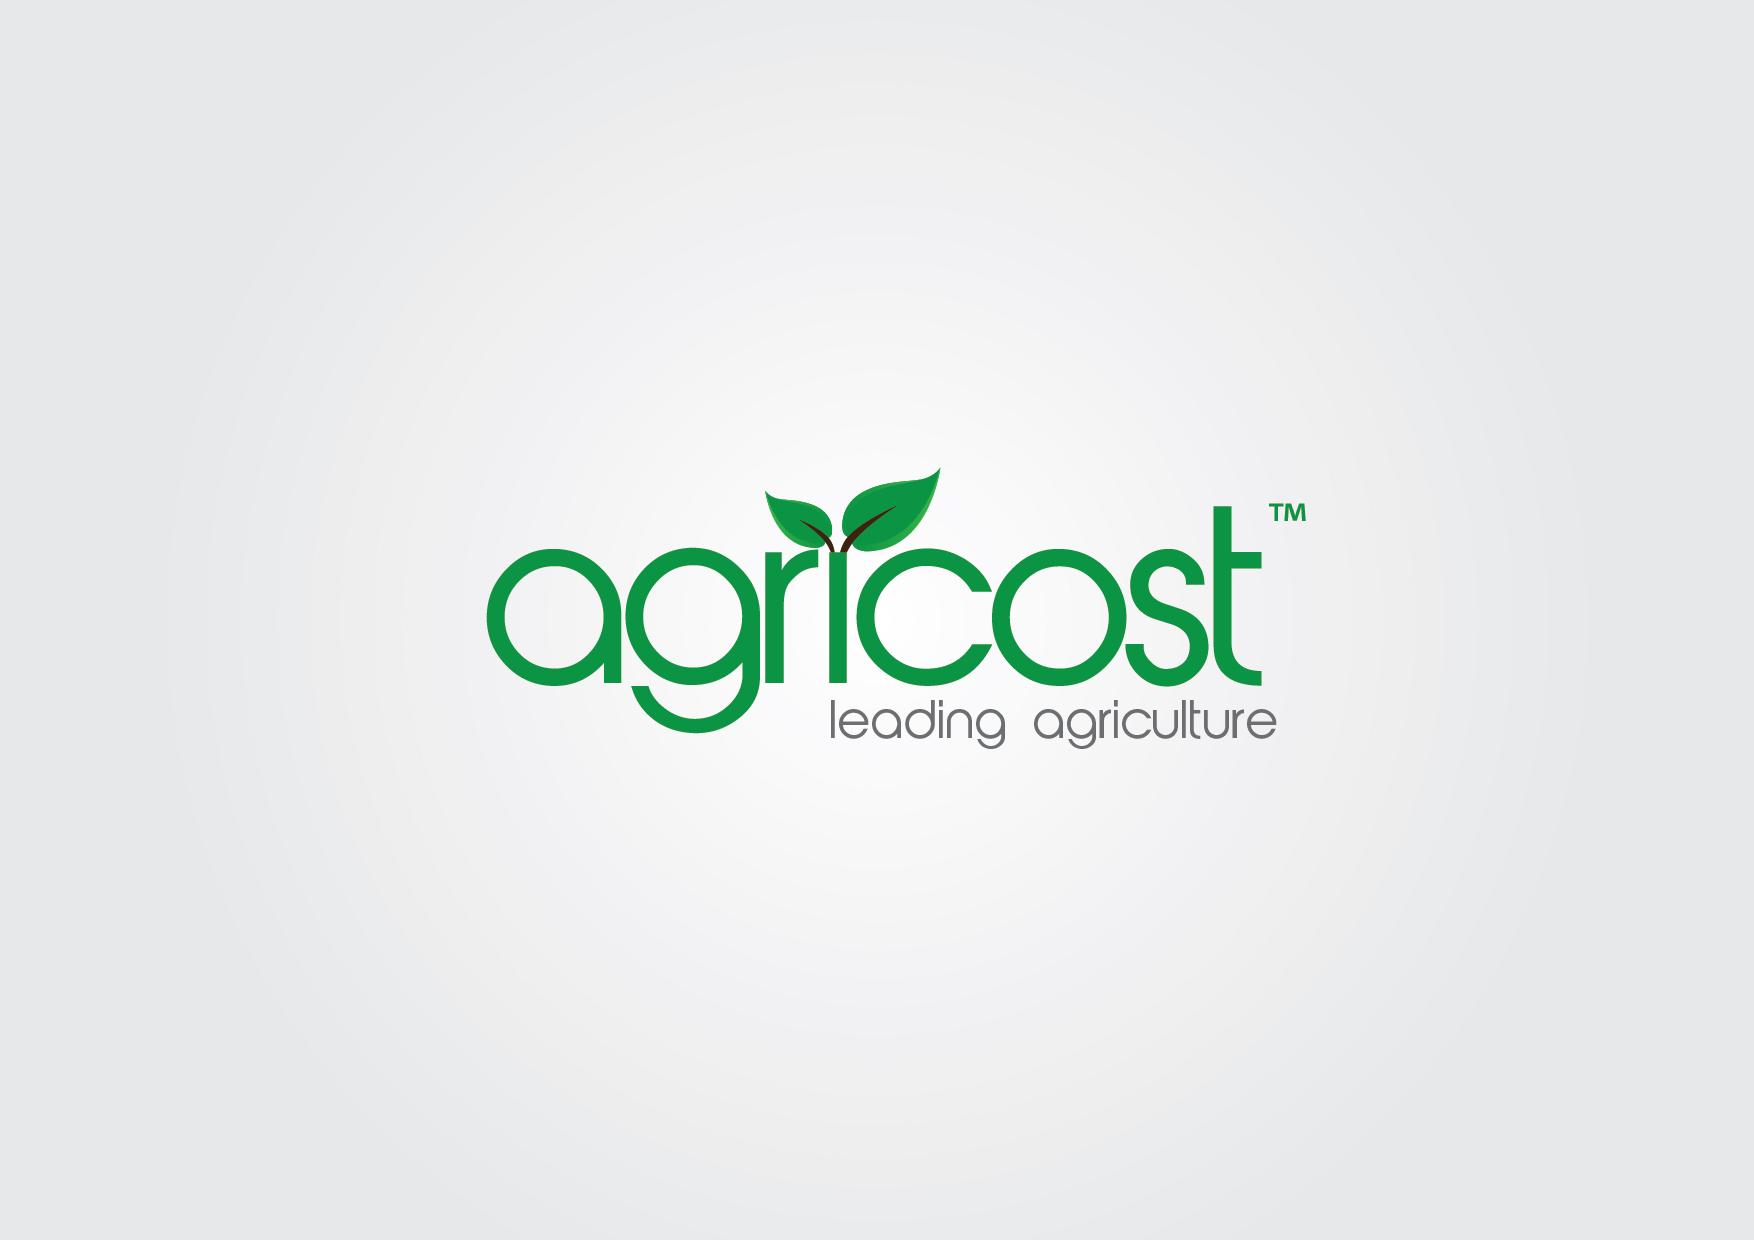 Agricost Logo